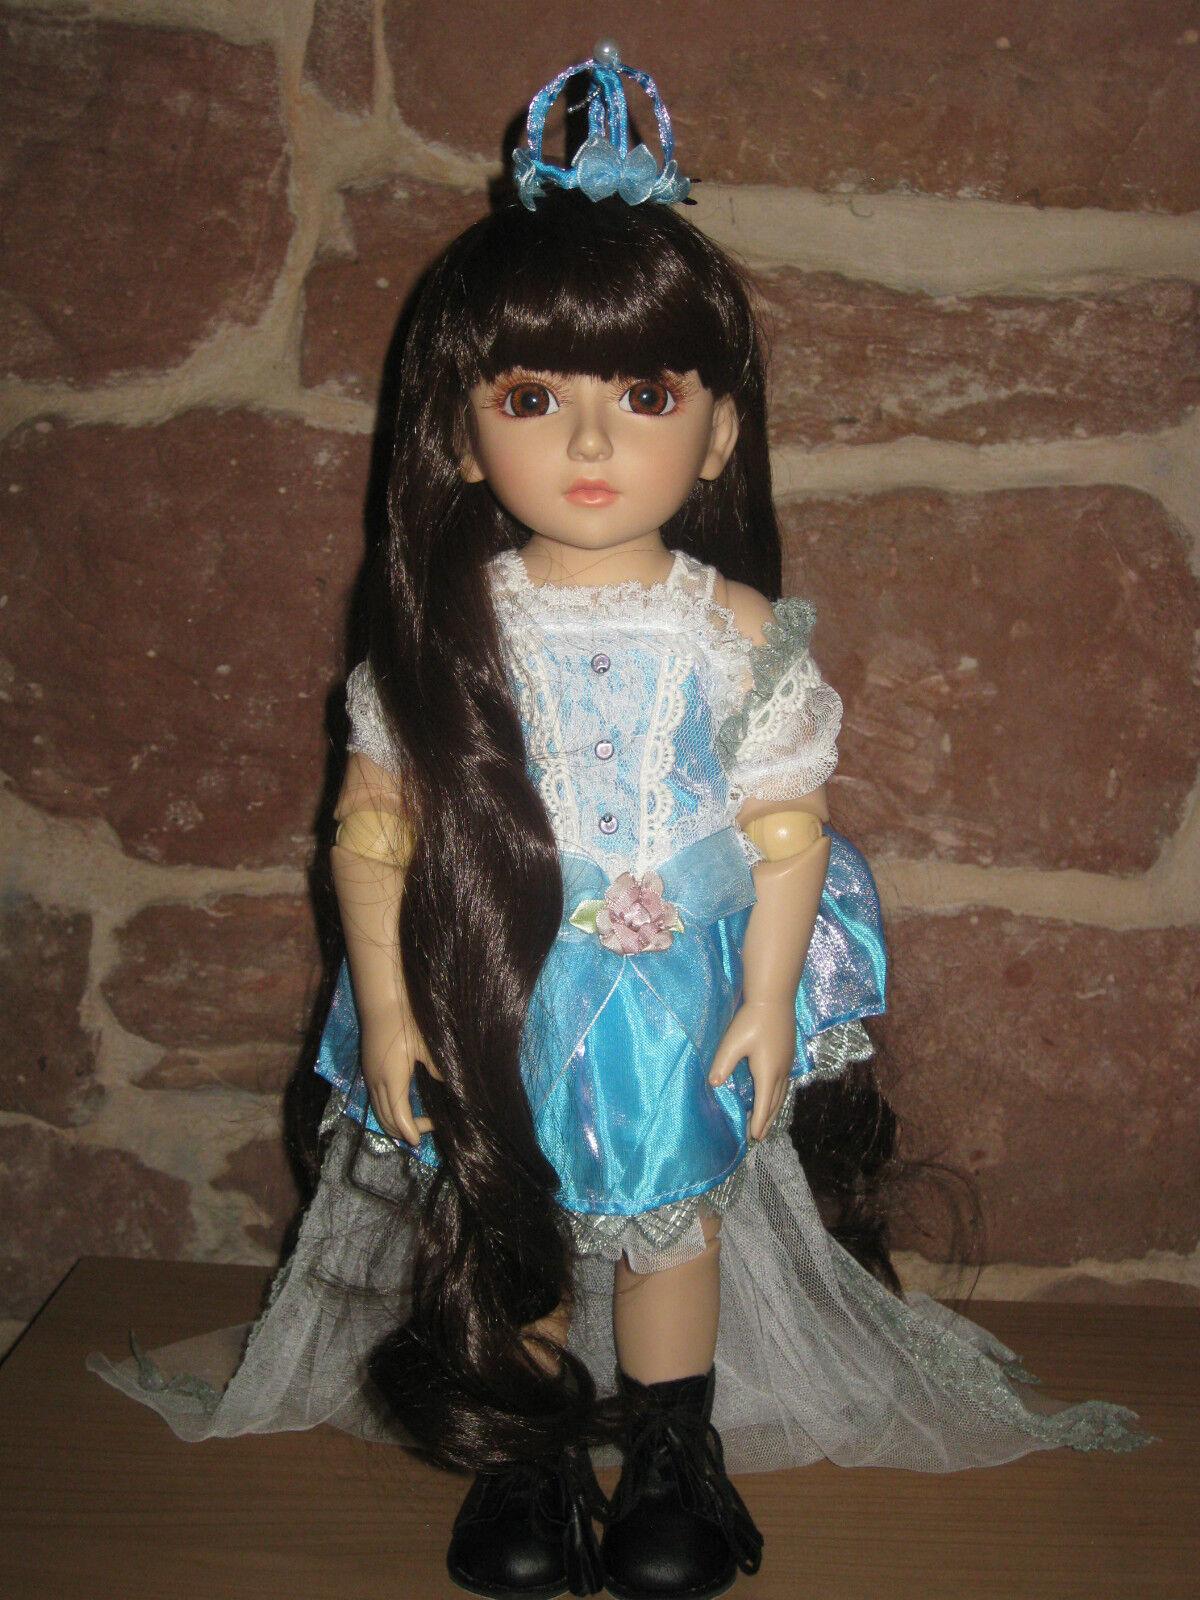 BAMBOLA, corpo duro, giunto BAMBOLA, PIANTANA BAMBOLA, 46cm, lunghi capelli castani, 2627